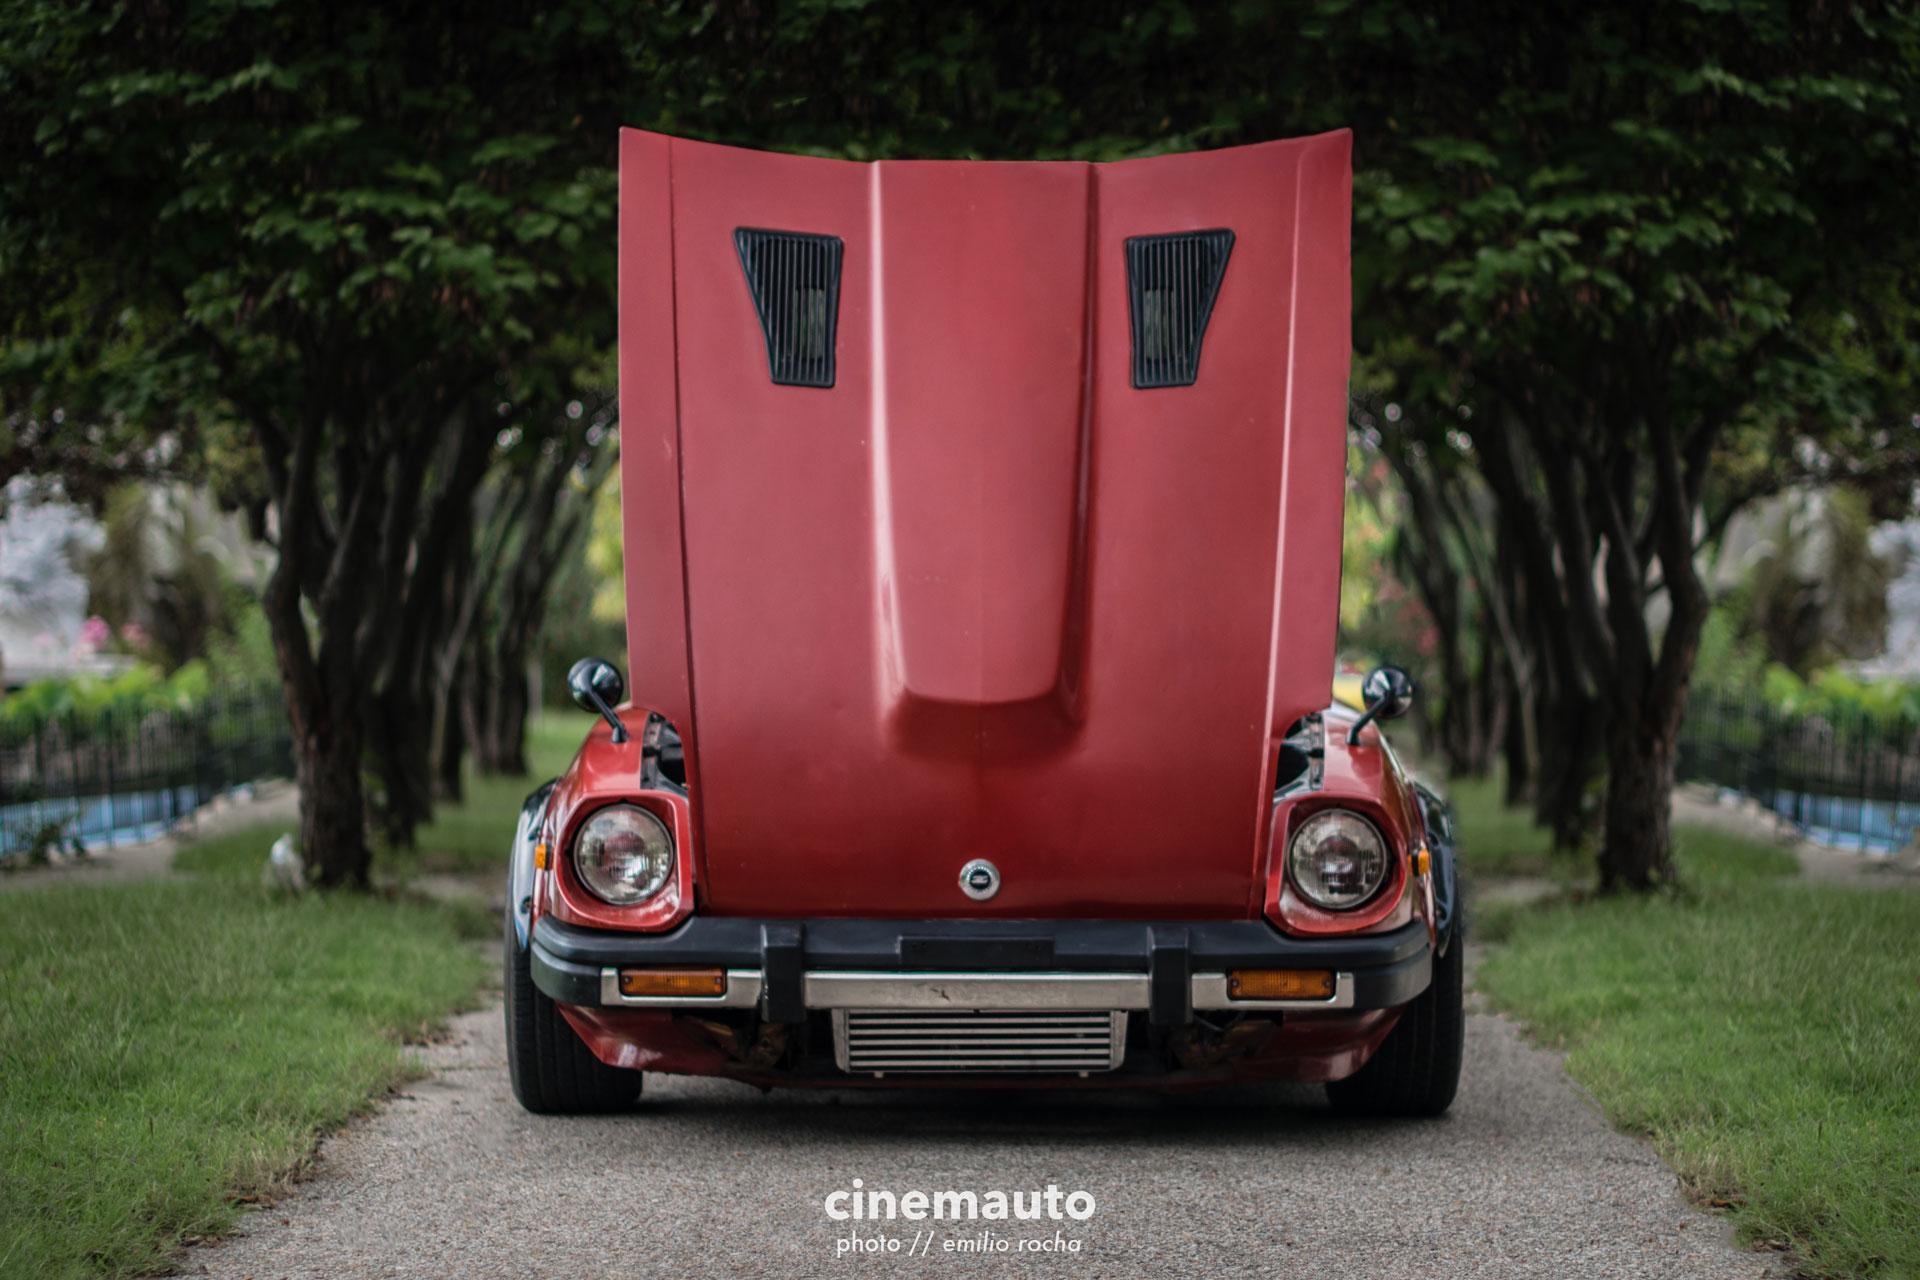 cinemauto-kansas-automotive-photography-datsun14.jpg